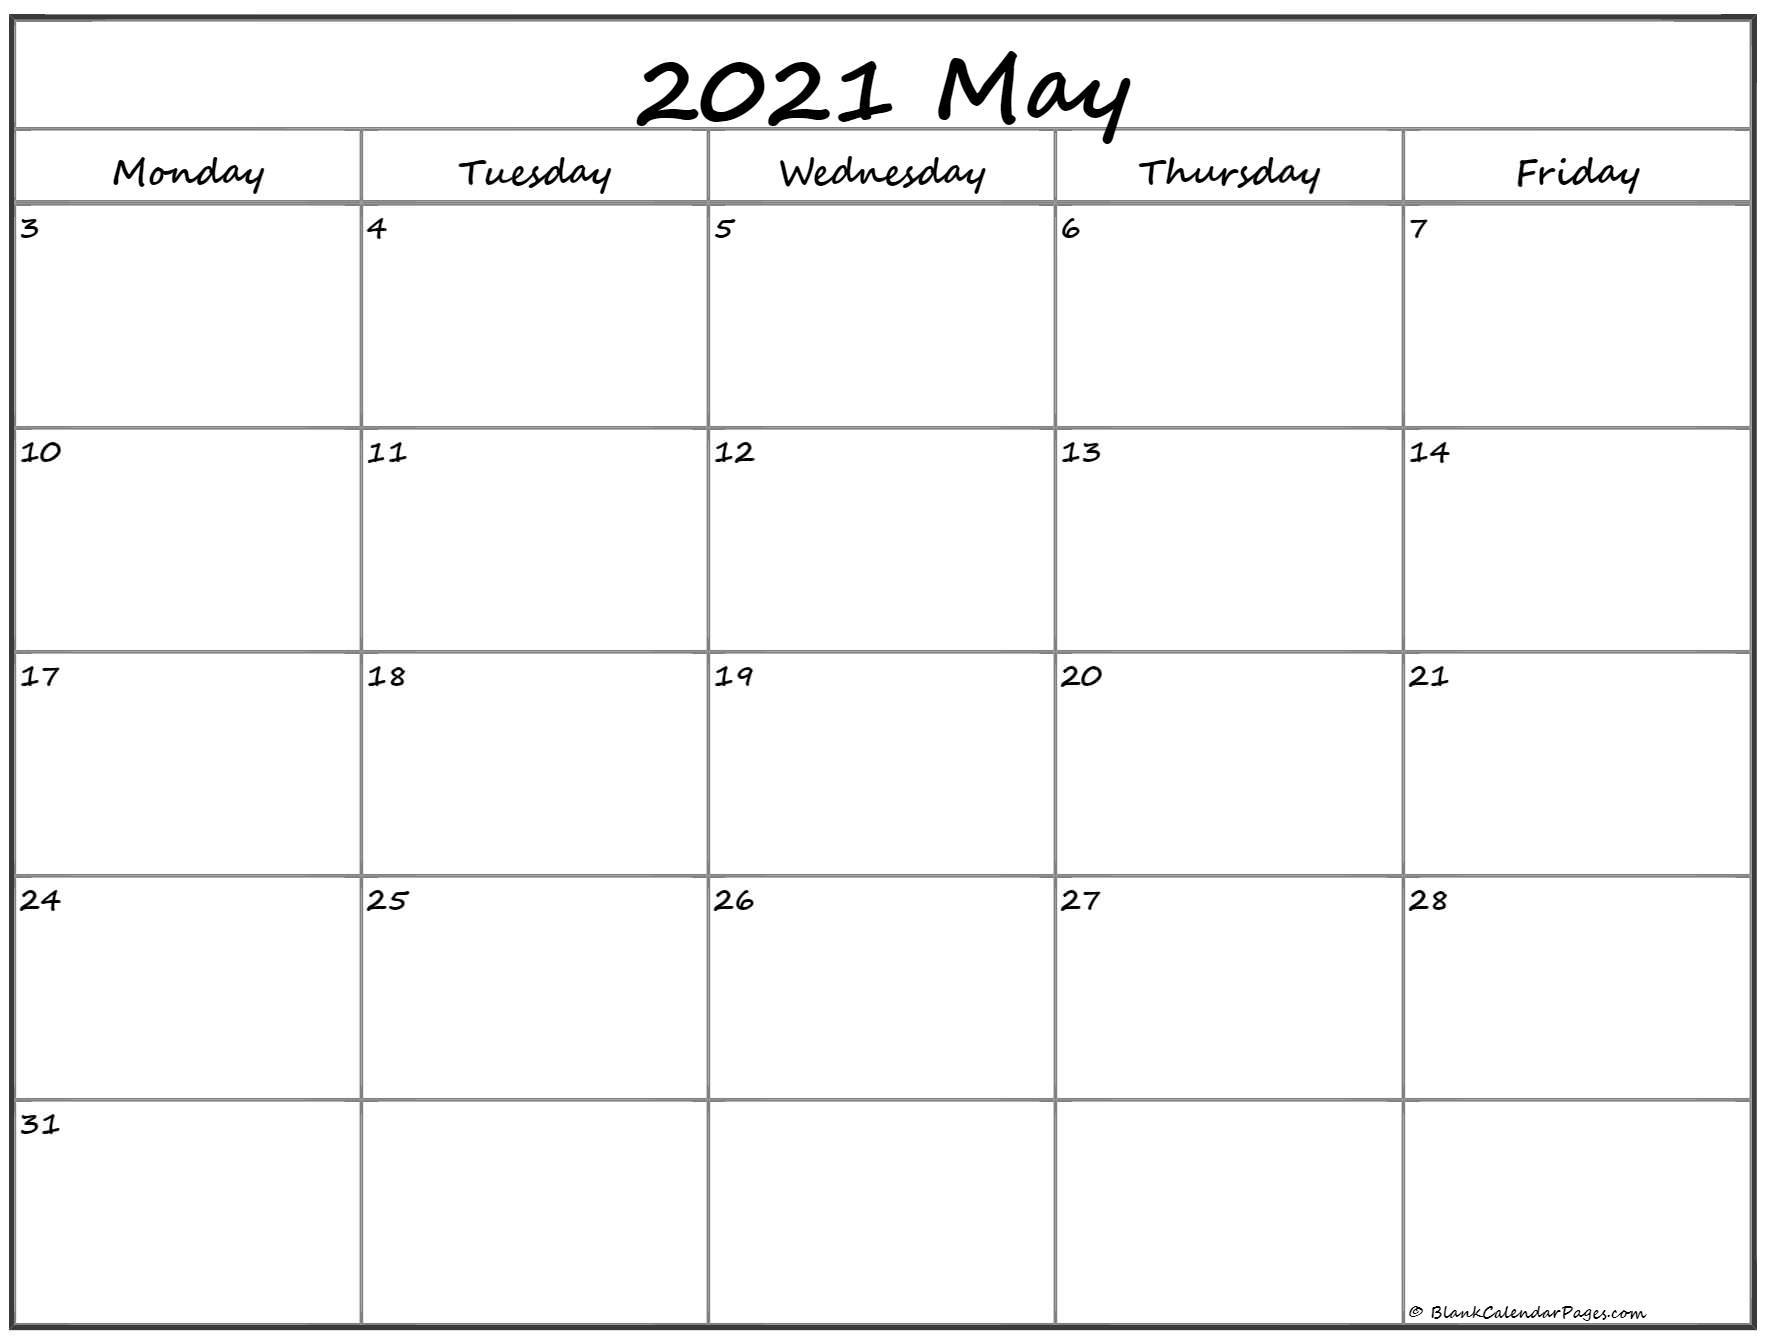 May 2021 Monday Calendar   Monday To Sunday